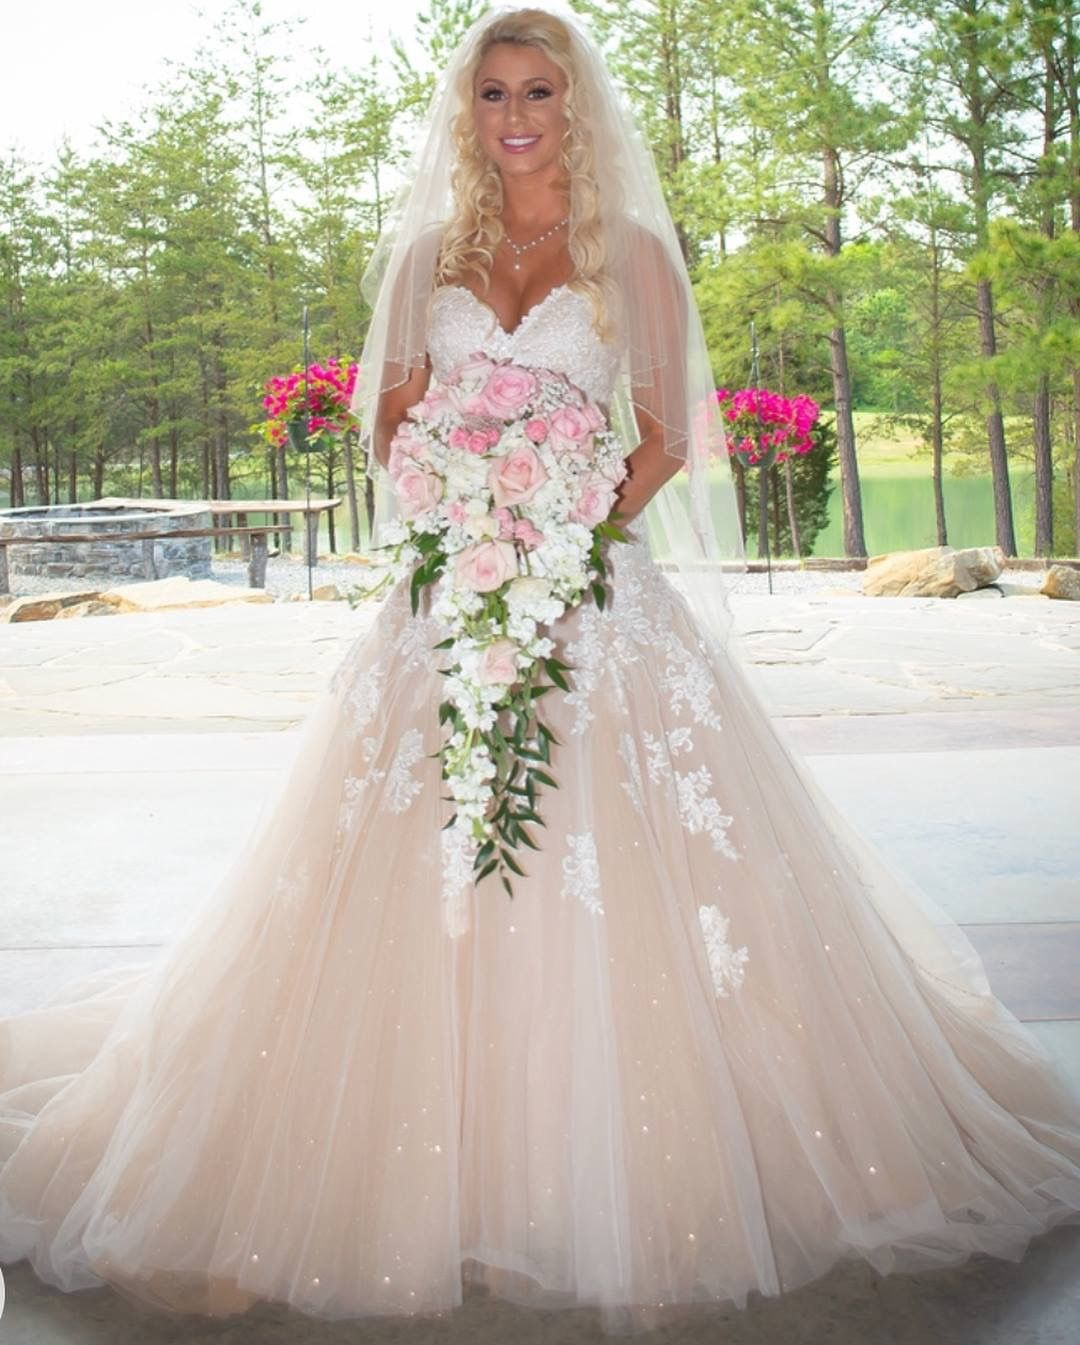 Southern belle wedding dresses  Southern belle wedding dress  My board  Pinterest  Southern belle